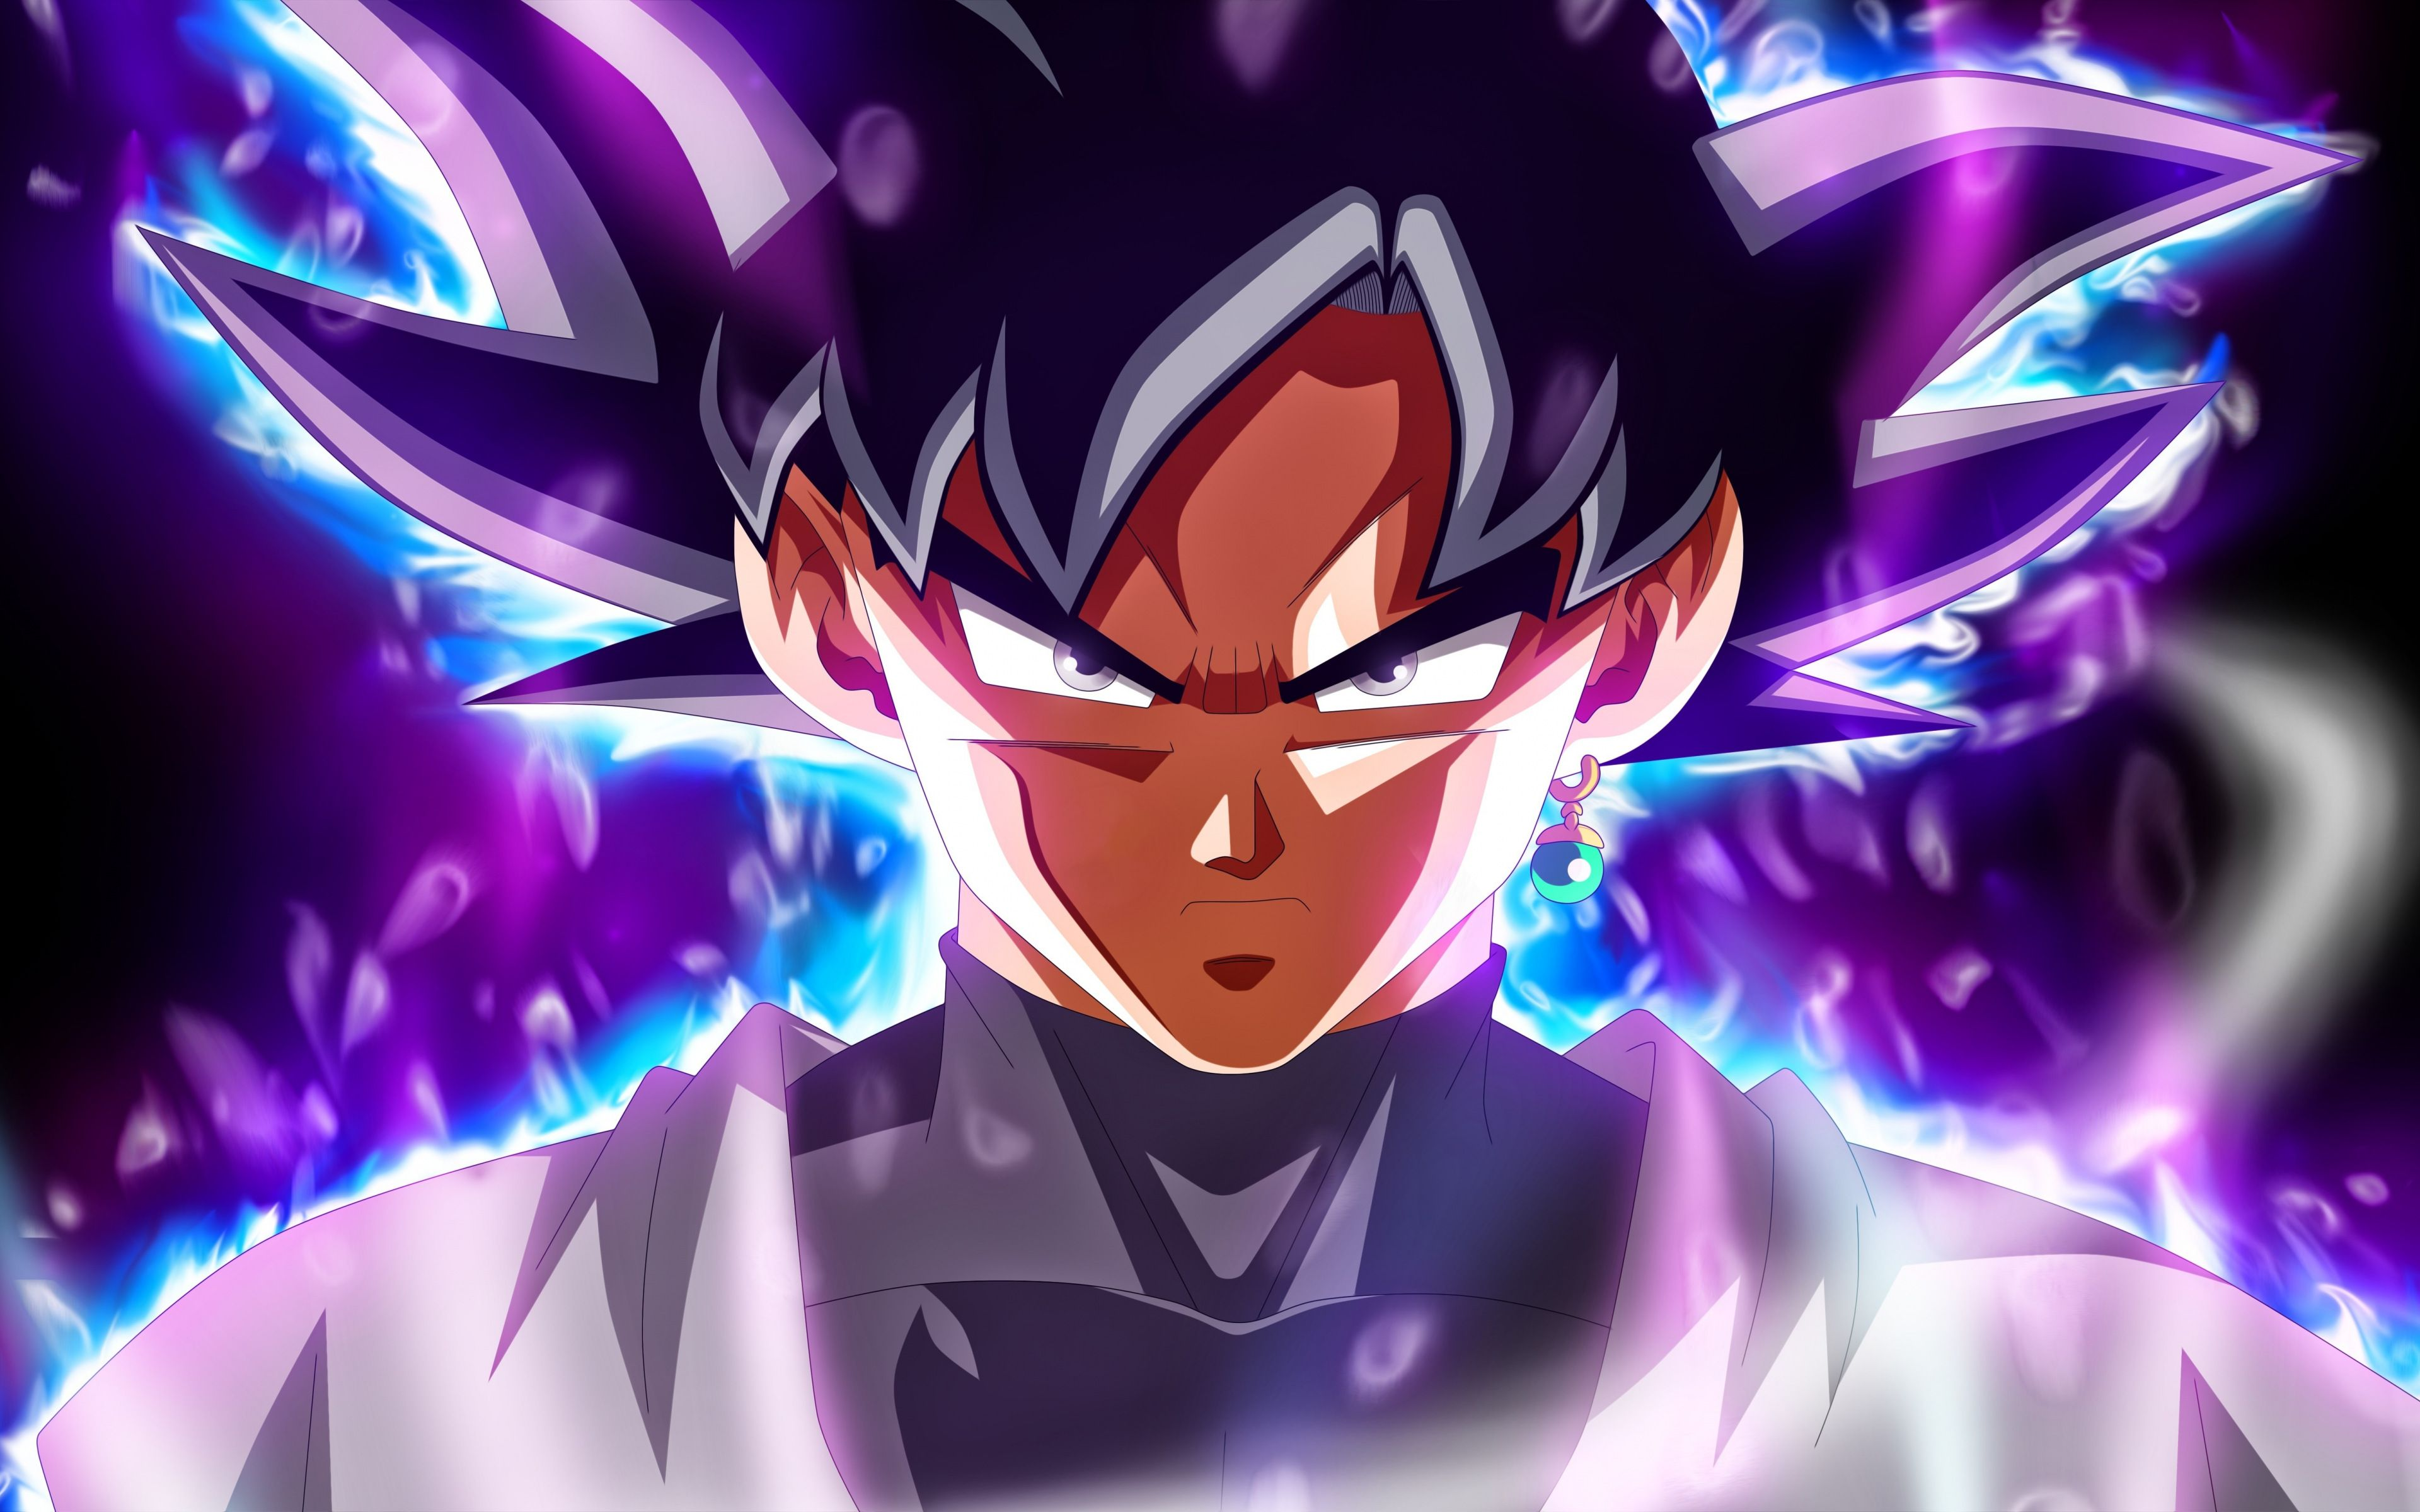 Black Goku Wallpapers - Top Free Black Goku Backgrounds ...